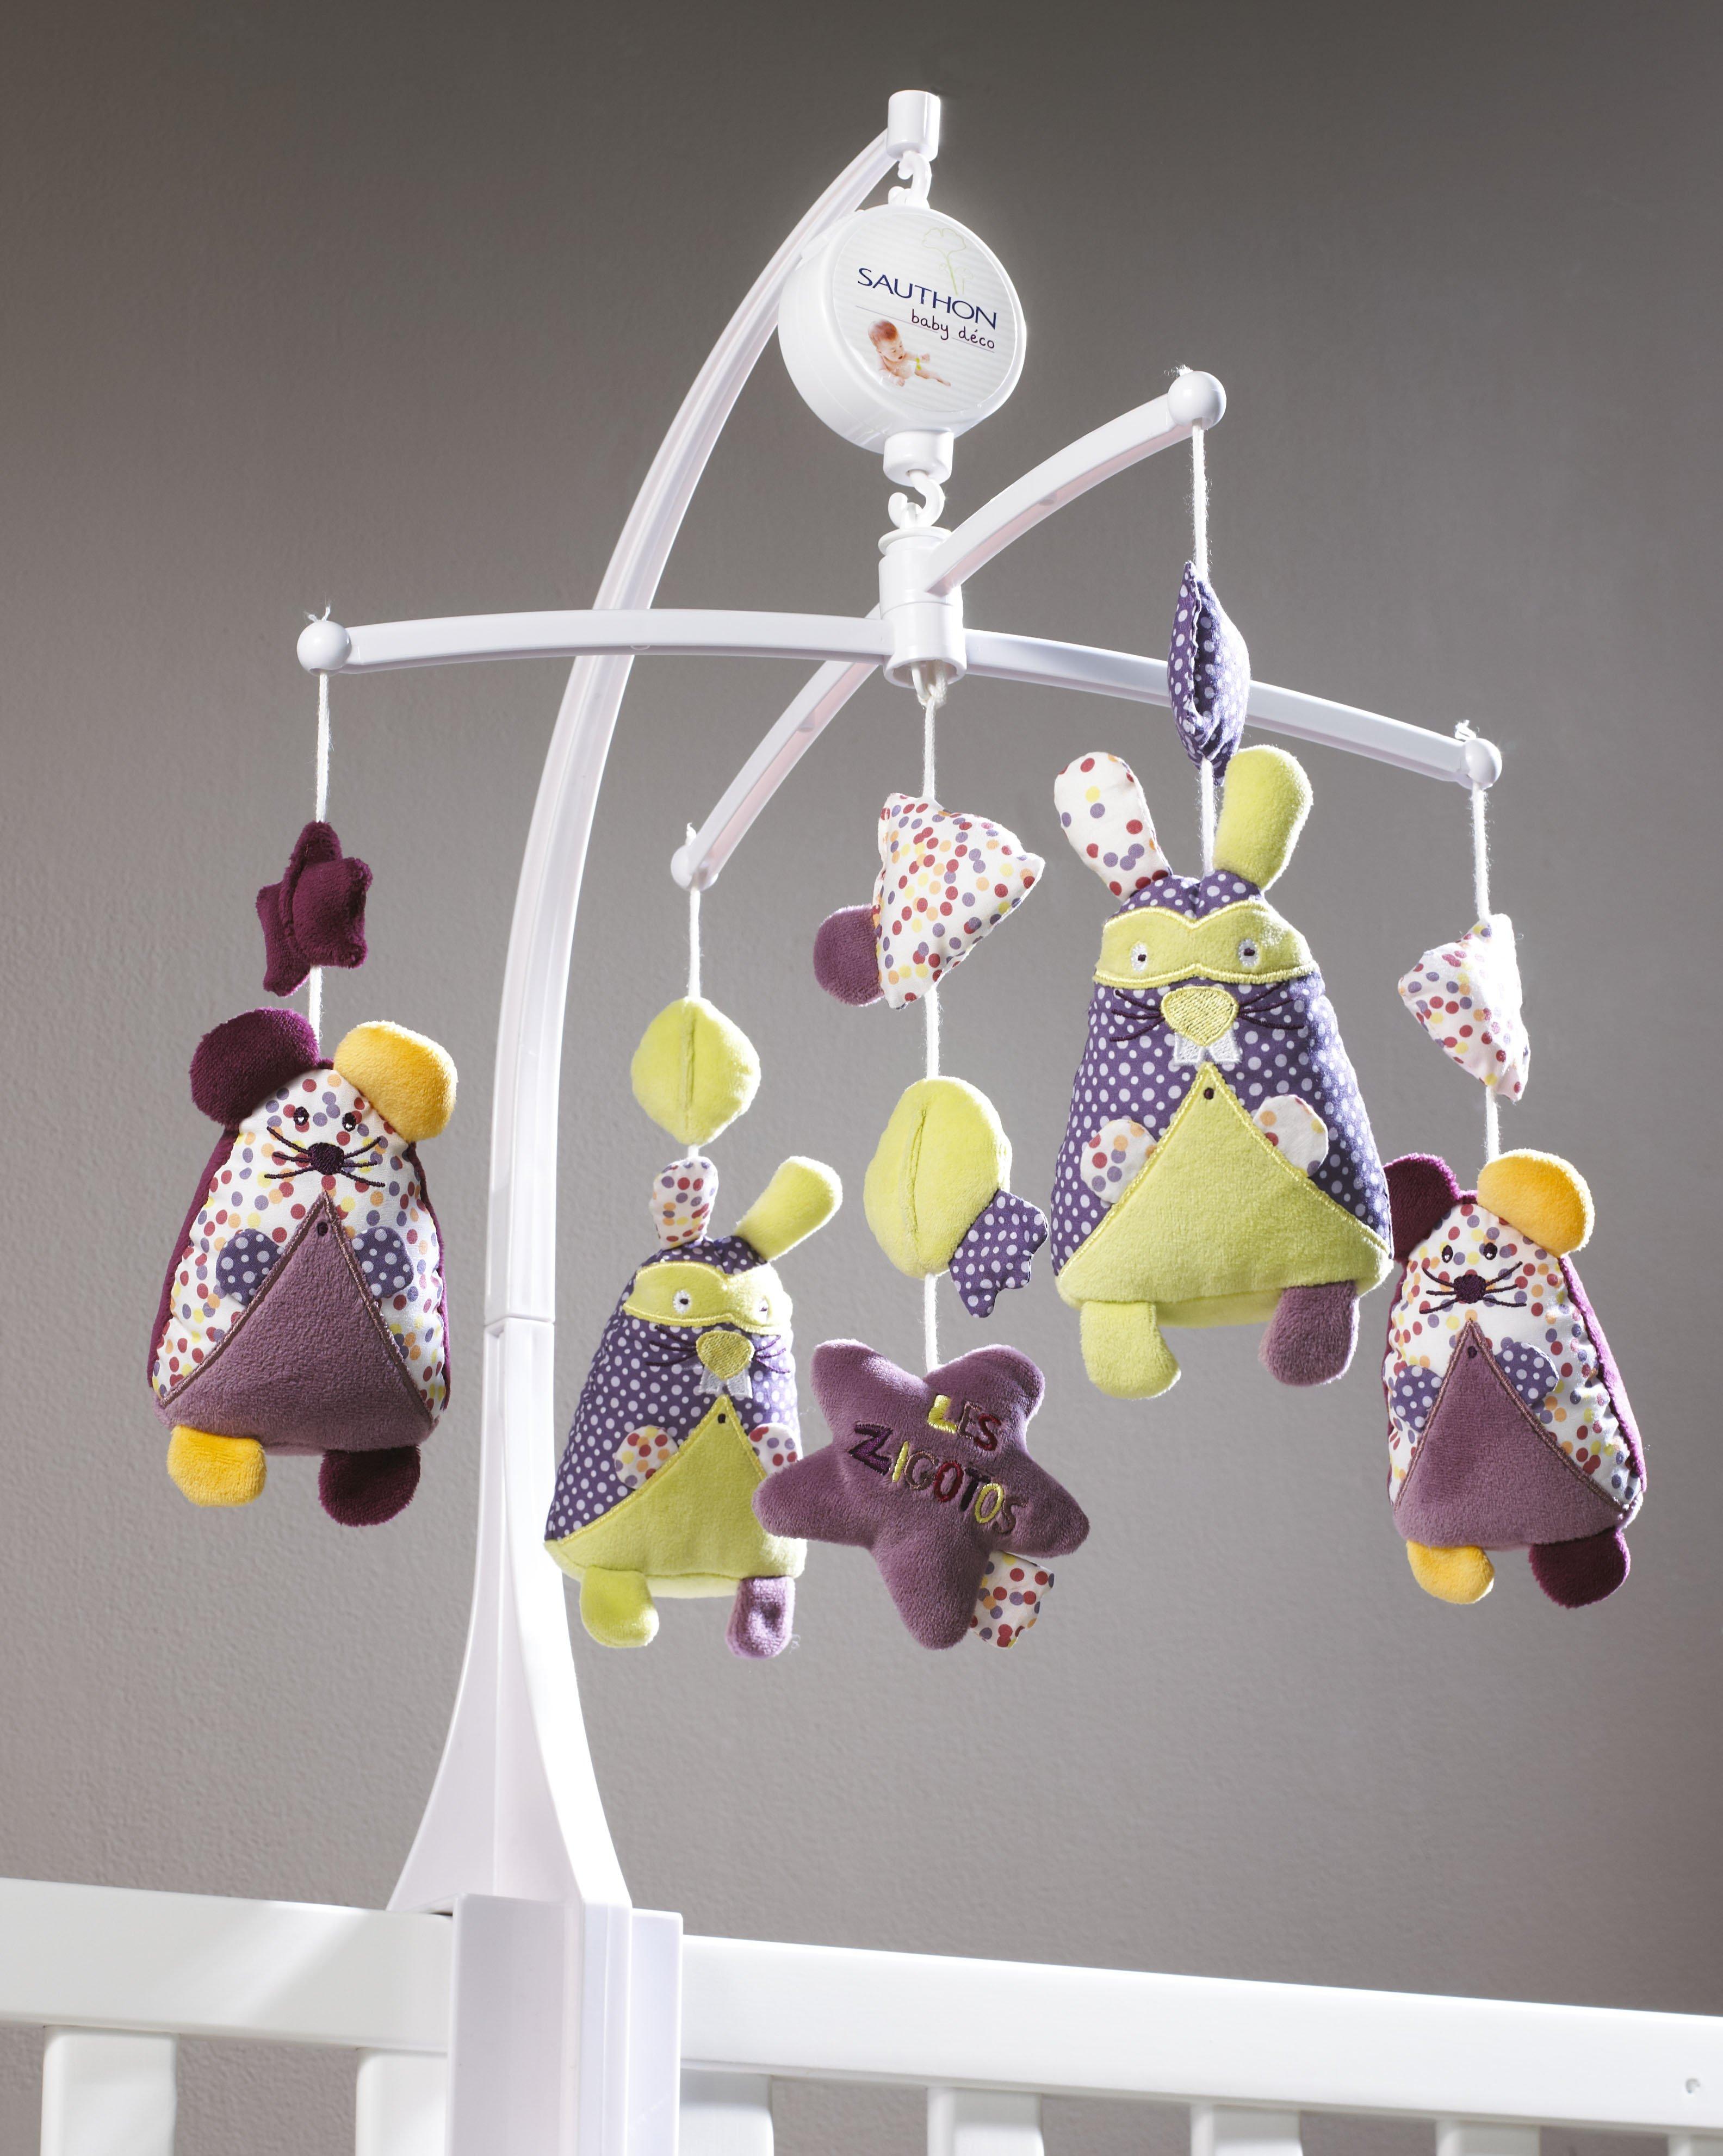 sauthon mobile musical chic for kids cat gorie lampe de chevet. Black Bedroom Furniture Sets. Home Design Ideas